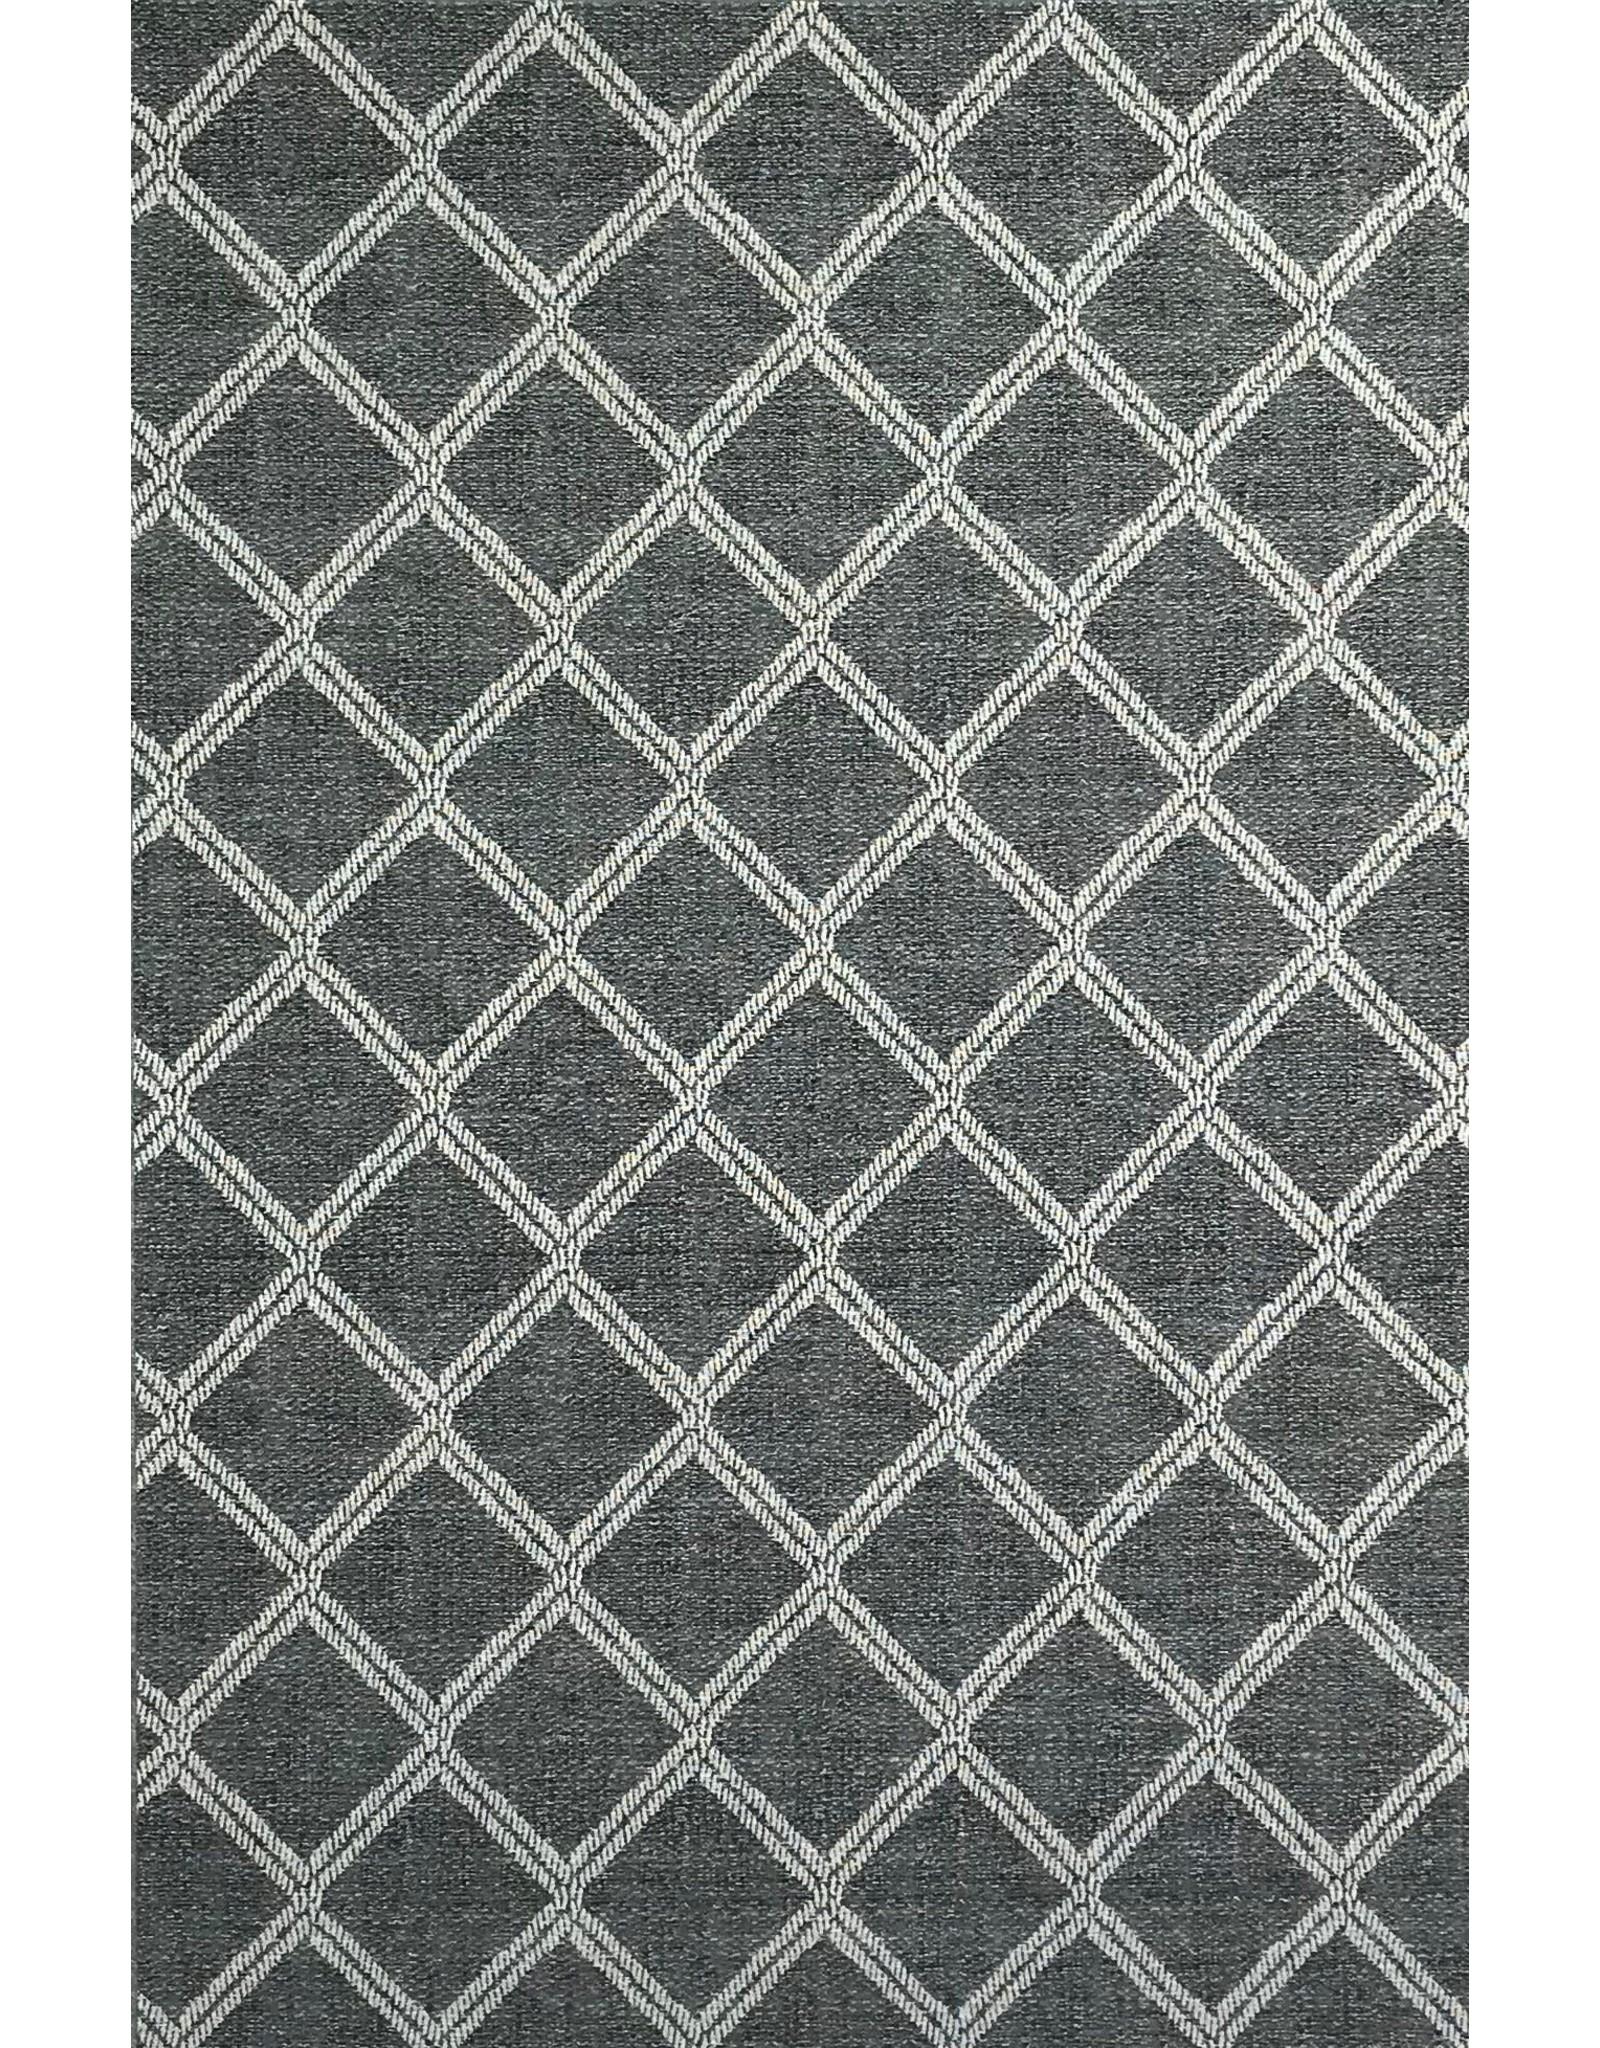 Tapis Esterno Matto Charcoal (2 x 4)